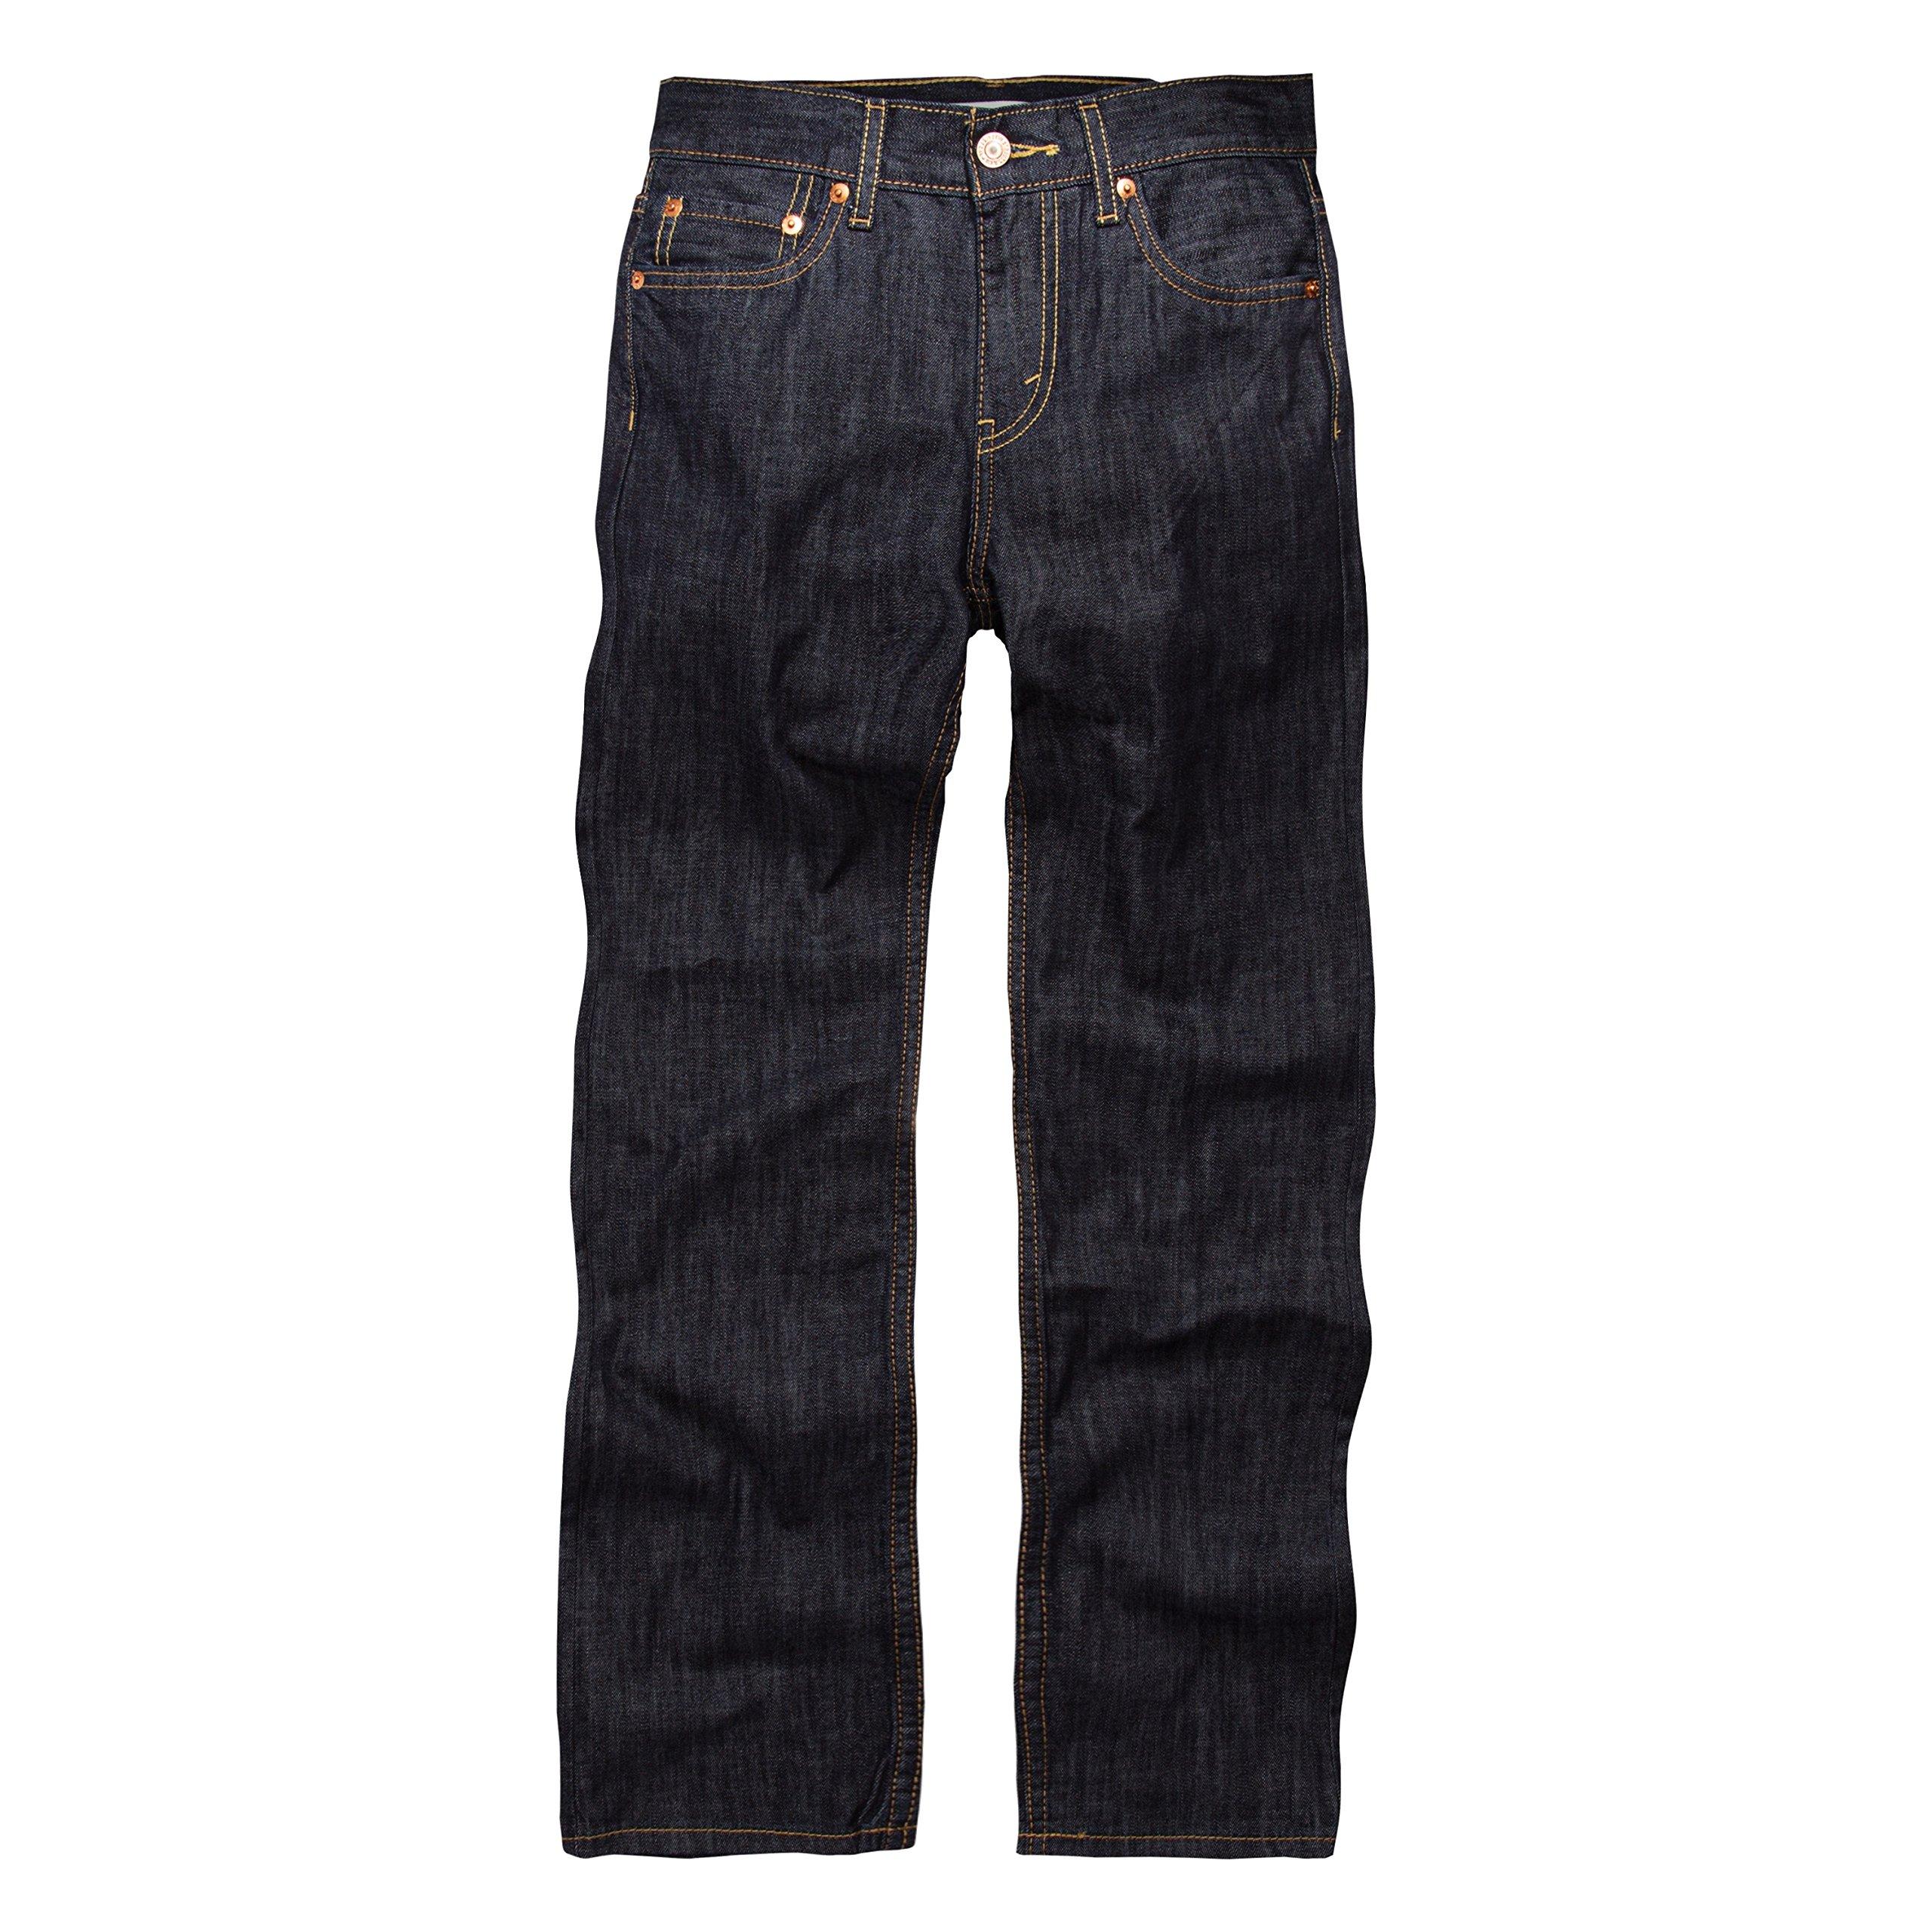 Levi's Boys' Big 514 Straight Fit Jeans, Ice Cap, 12